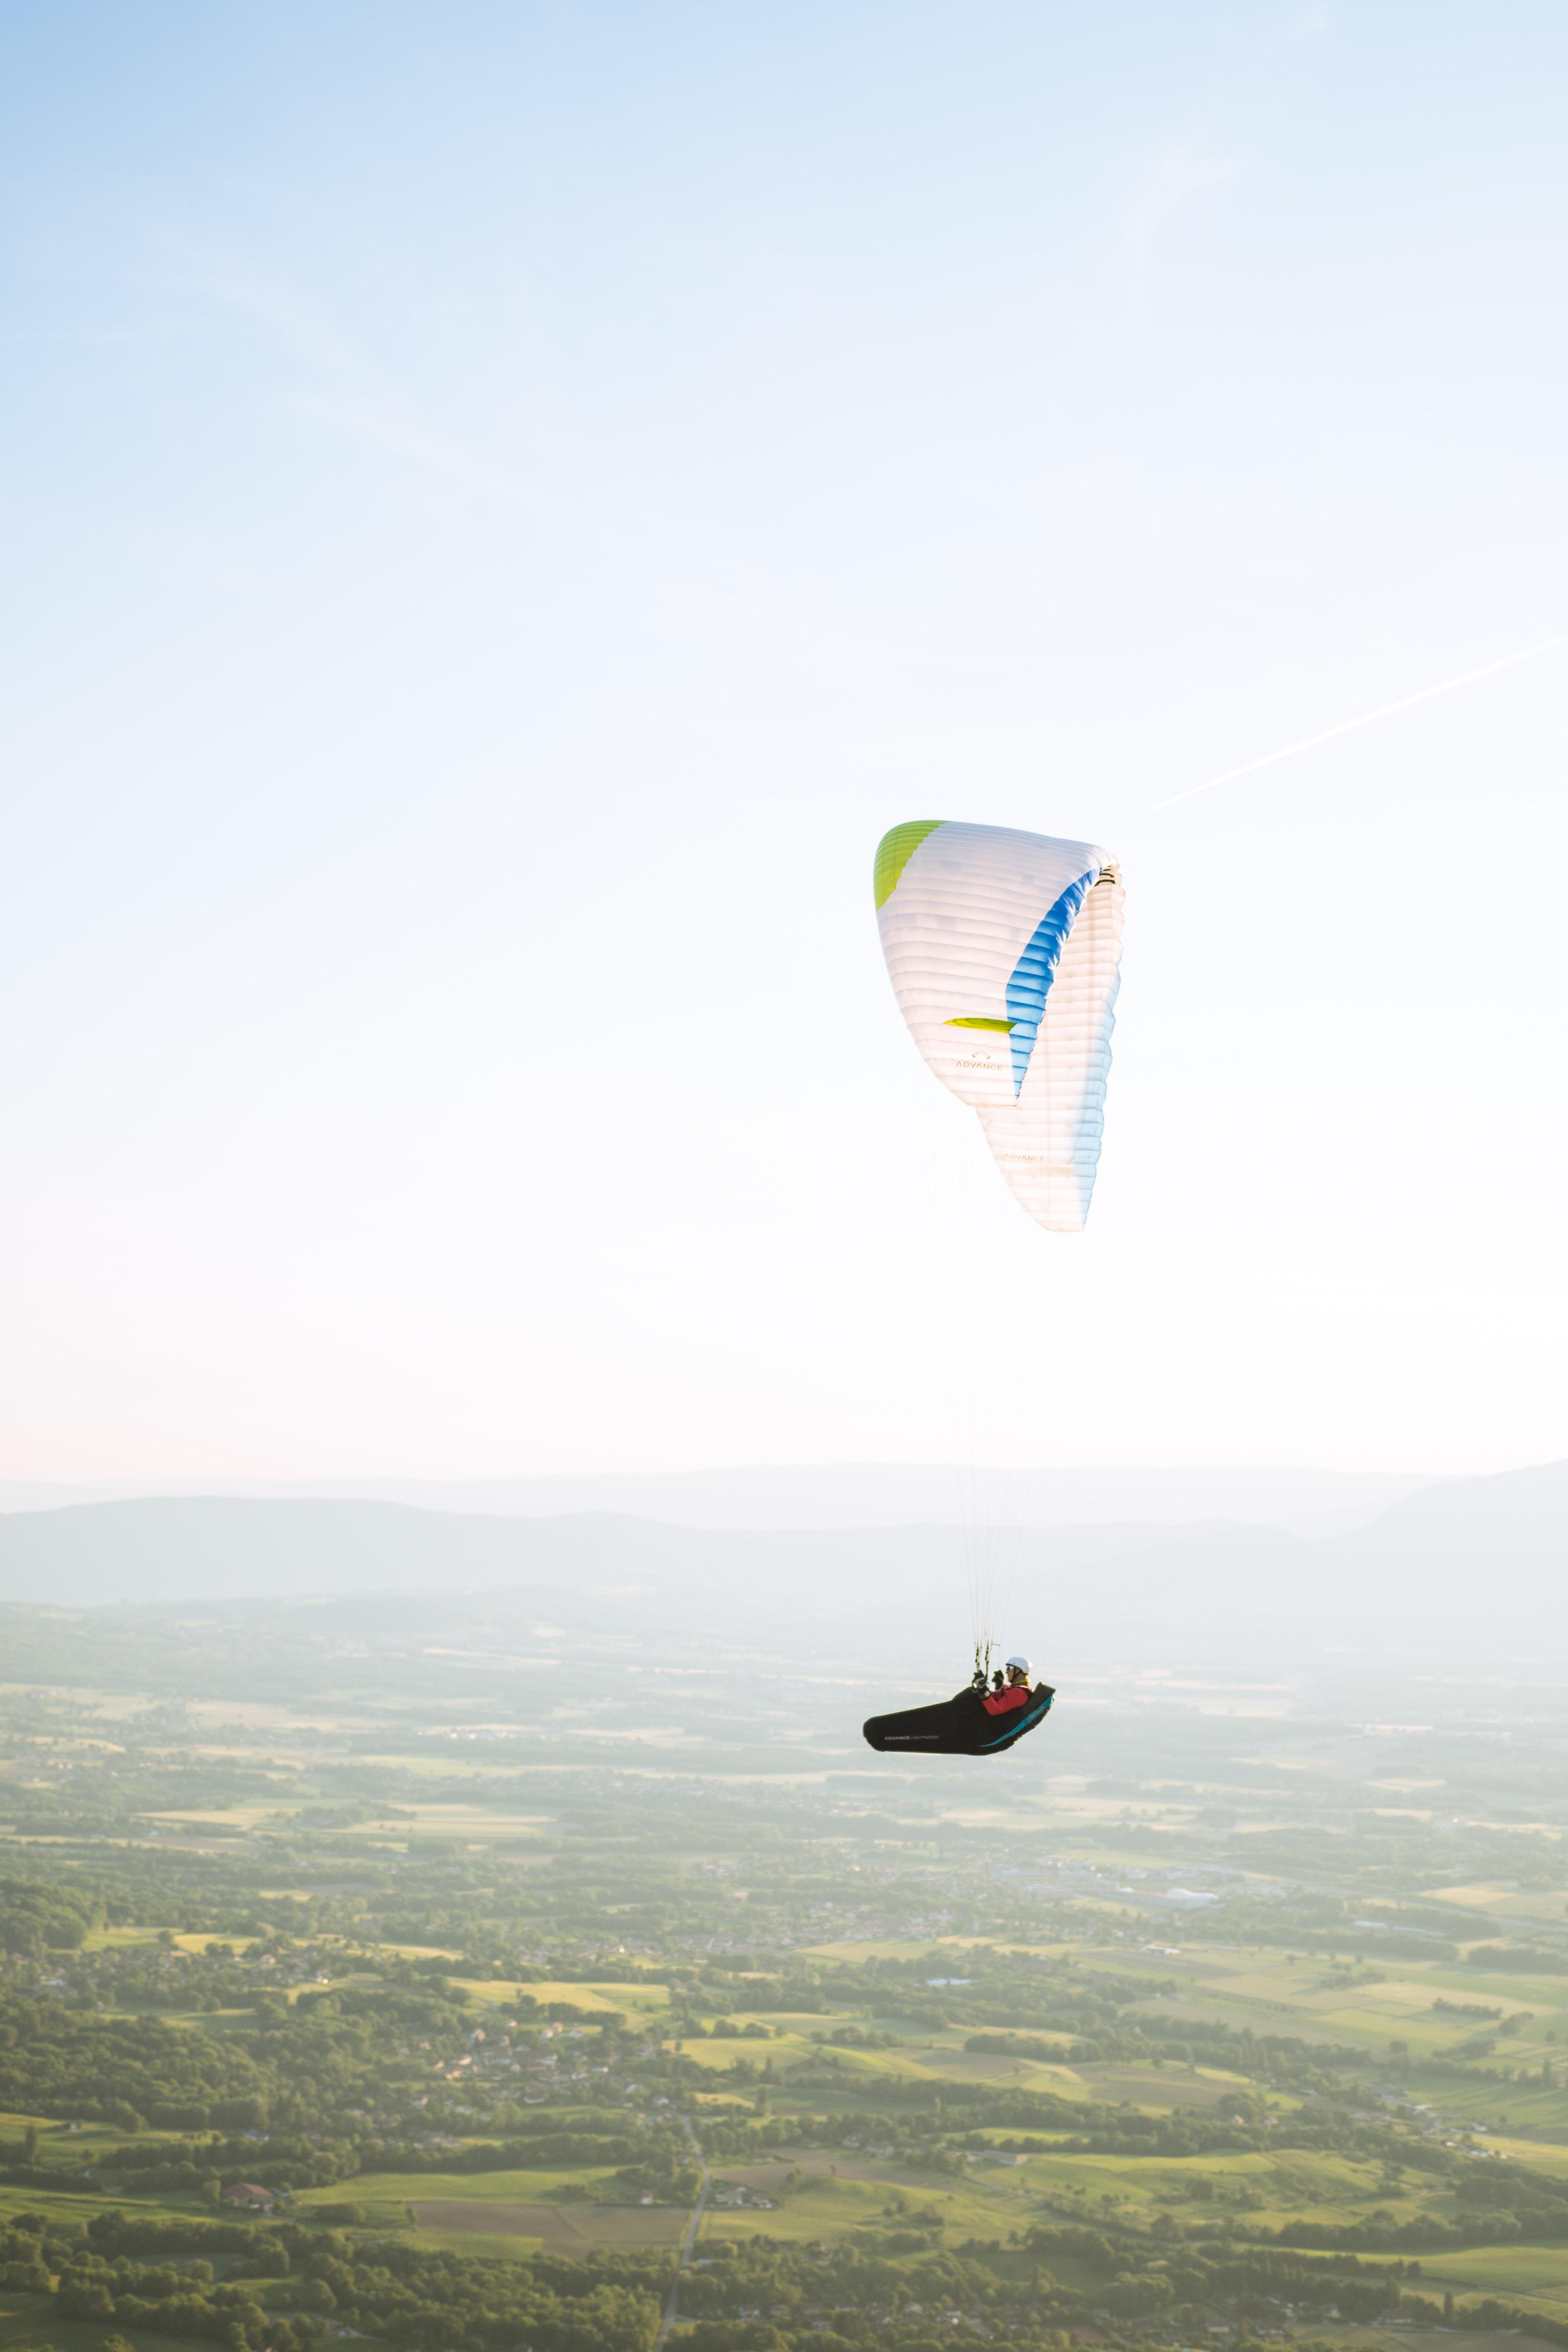 aerial photography of a man parachuting